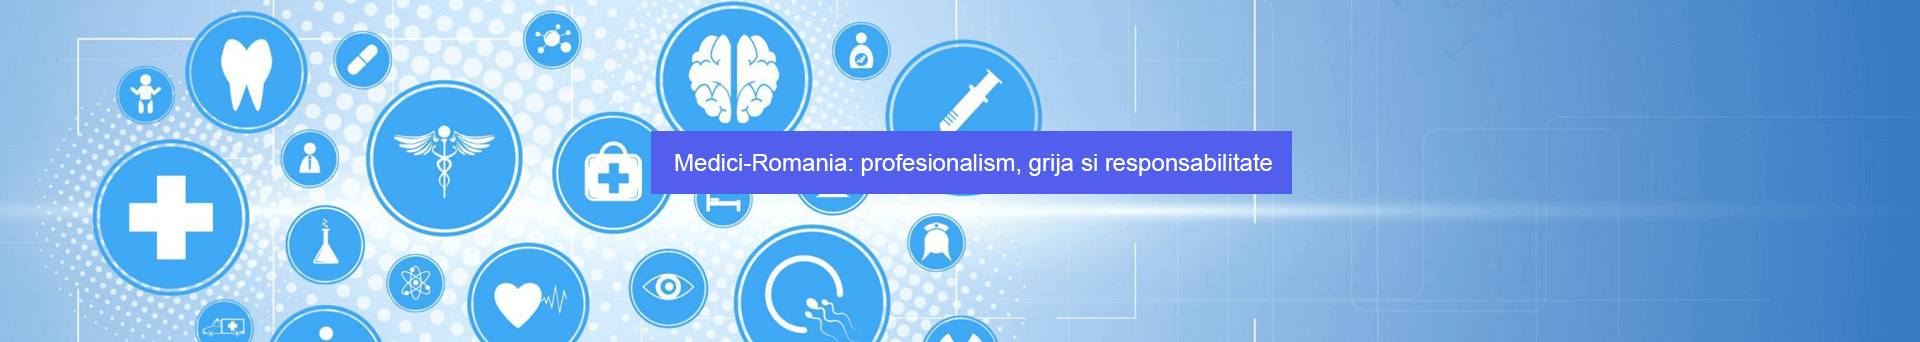 Medici-Romania: profesionalism, grija si responsabilitate